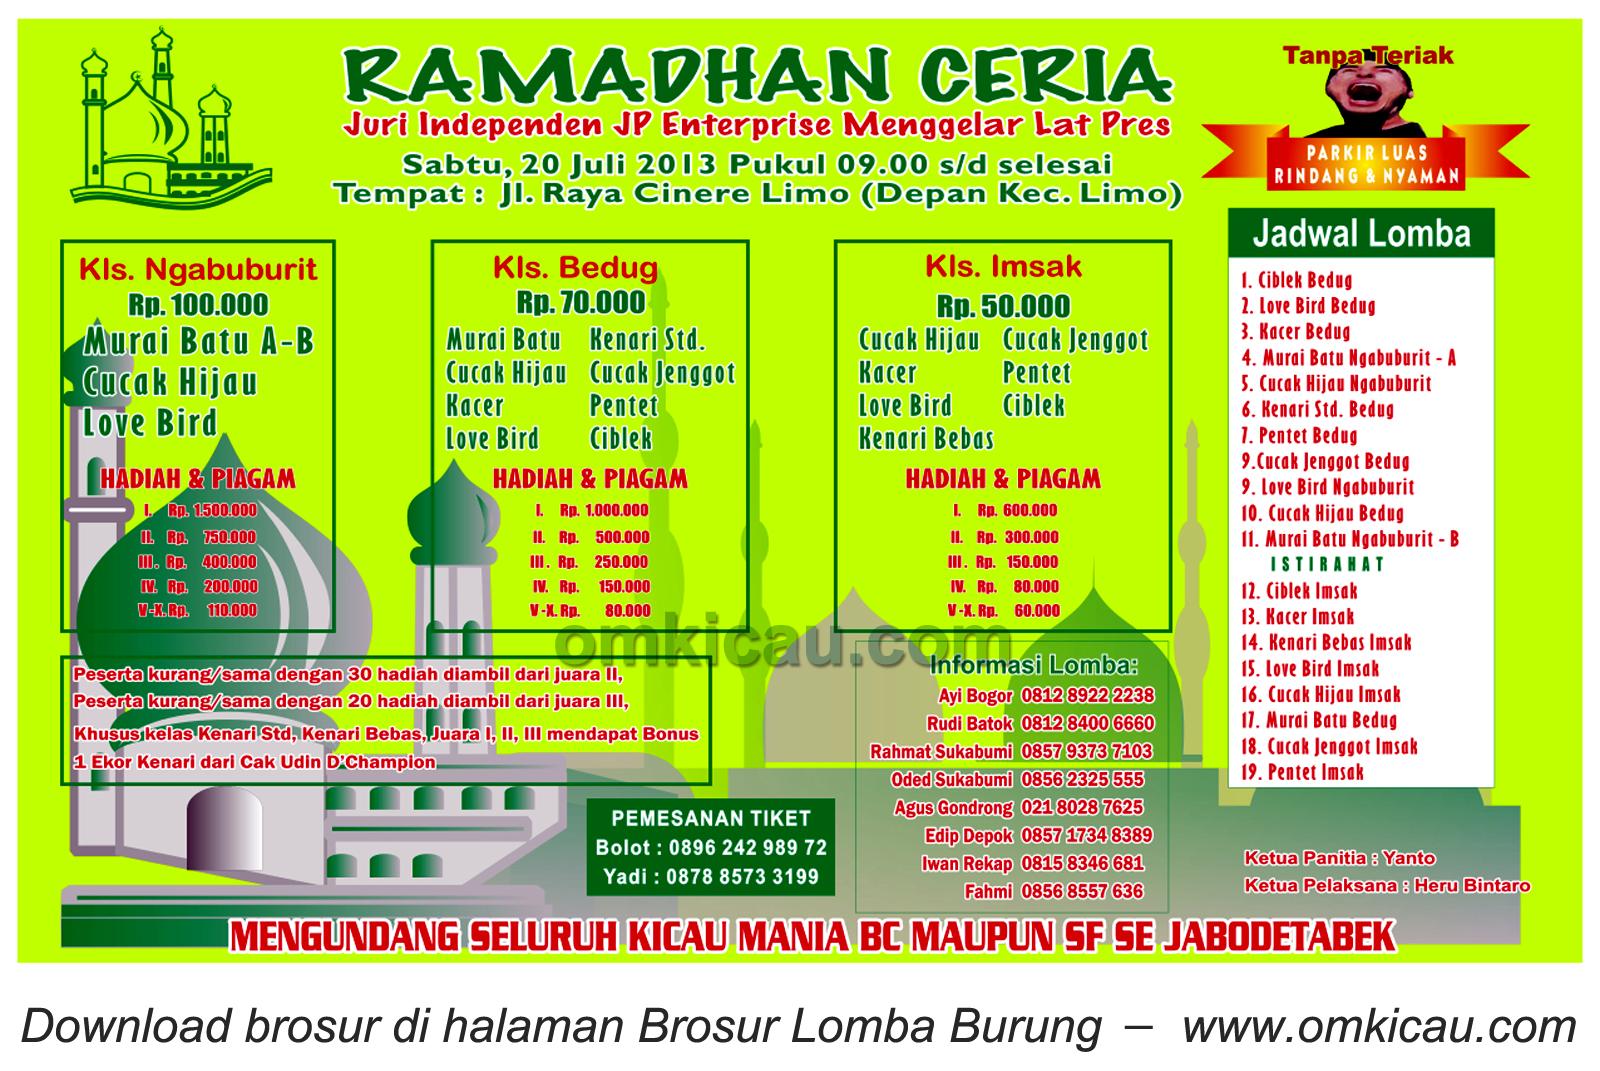 Brosur Latpres Ramadhan Ceria JP Ent Depok 20 Juli 2013